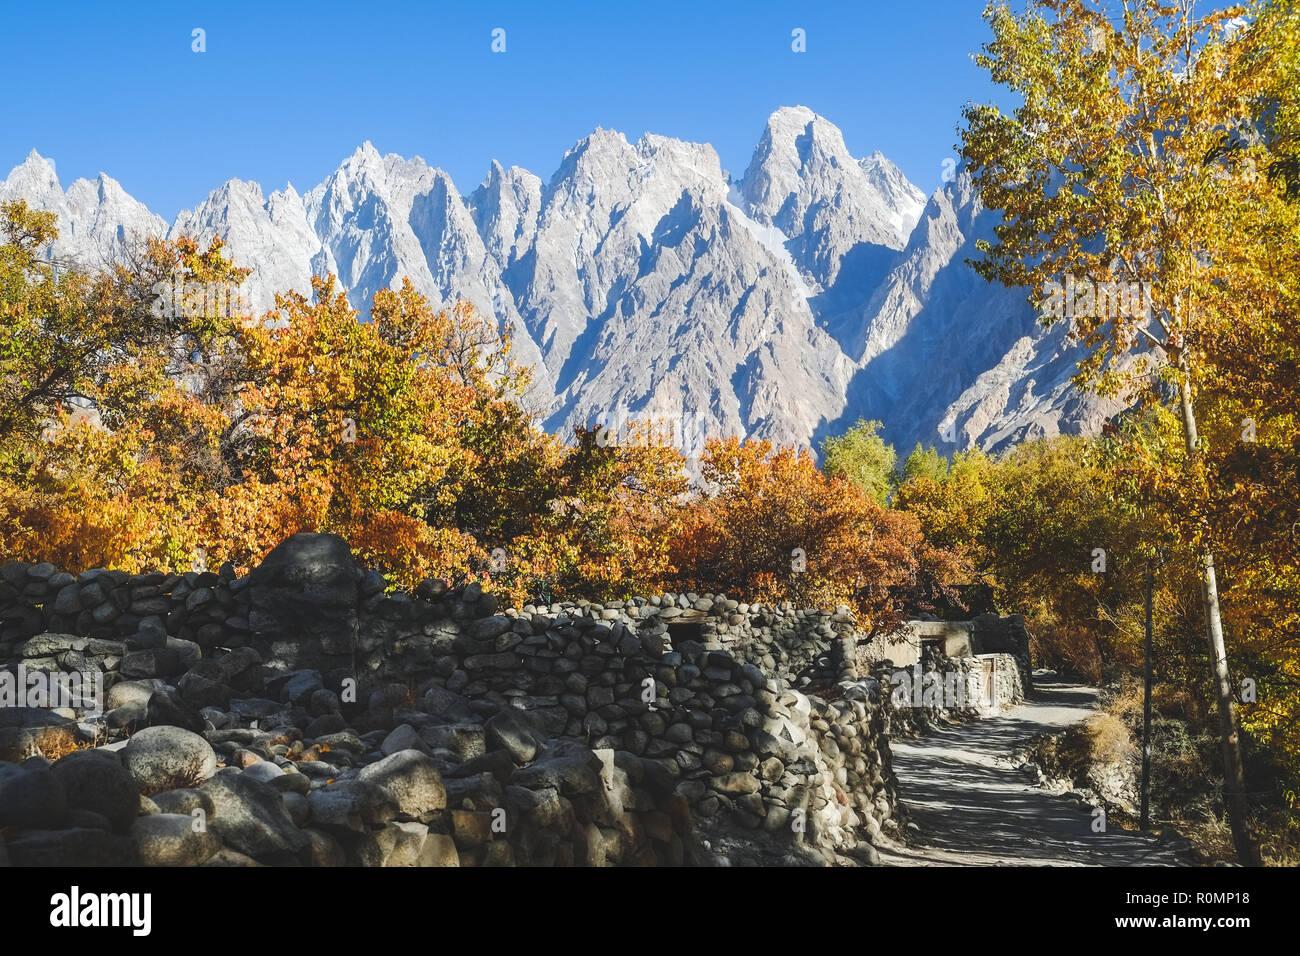 Landscape view of Passu village in autumn. Gilgit Baltistan, Pakistan. - Stock Image